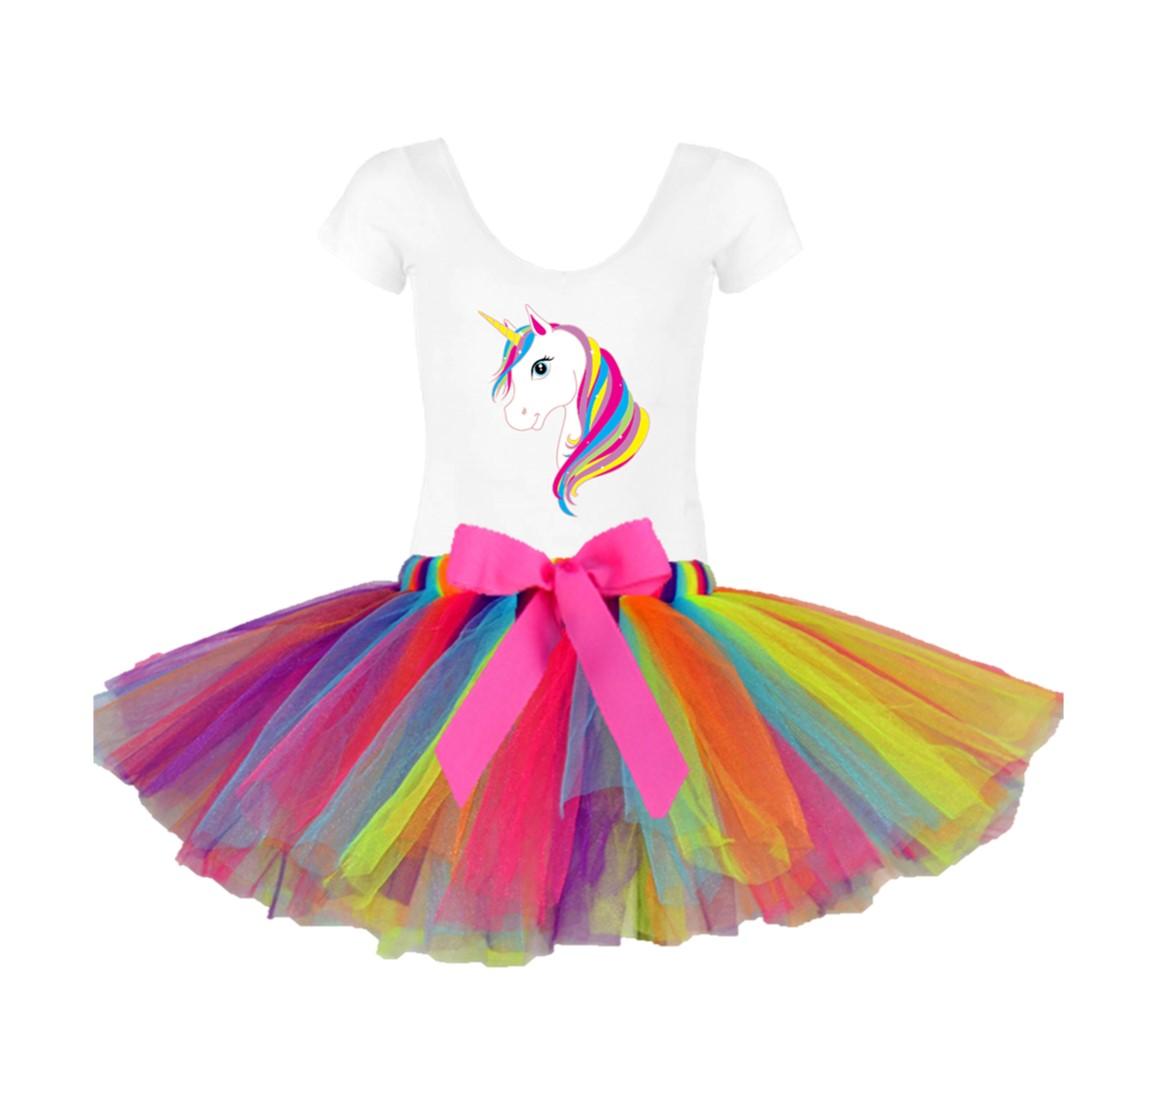 Fantasia Infantil Tutu Unicornio No Elo7 Tn Kids B57f6c